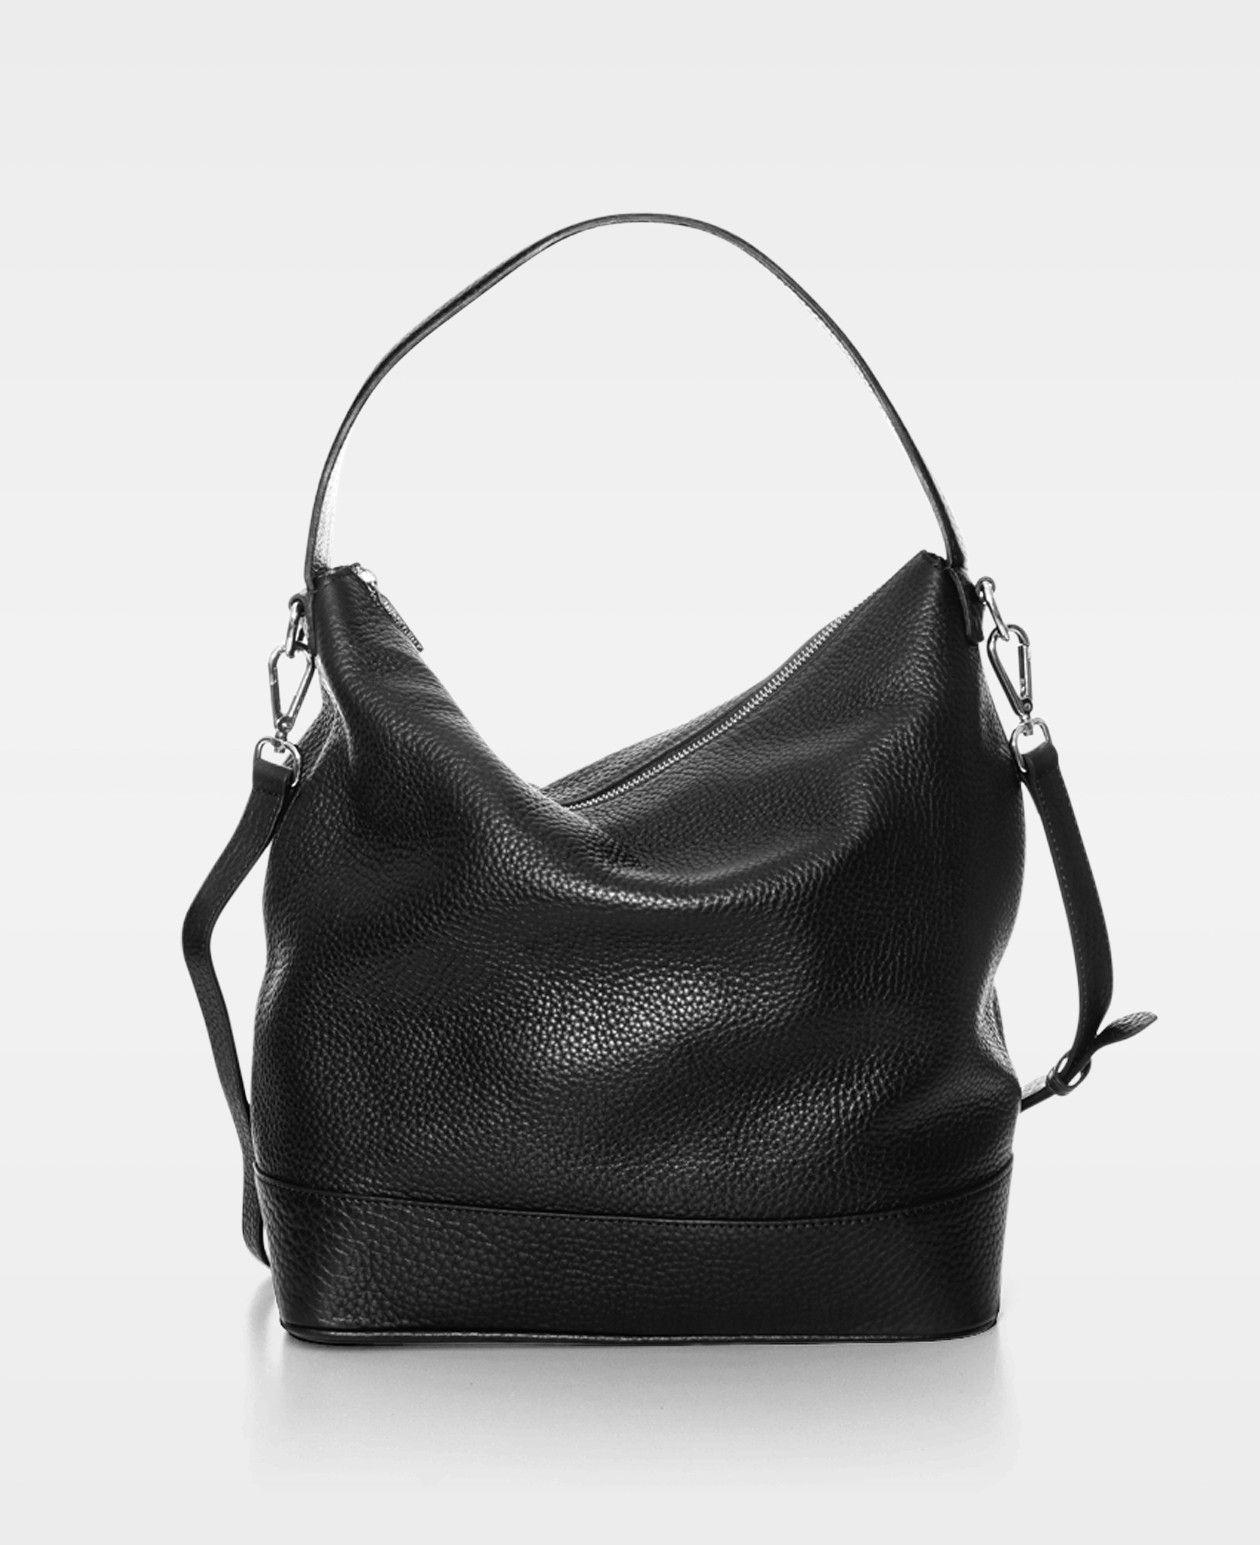 9c32db5fdf47 Big Handbag Shop Womens Small Plain Top Handle Messenger Cross Body Bag (  Black)